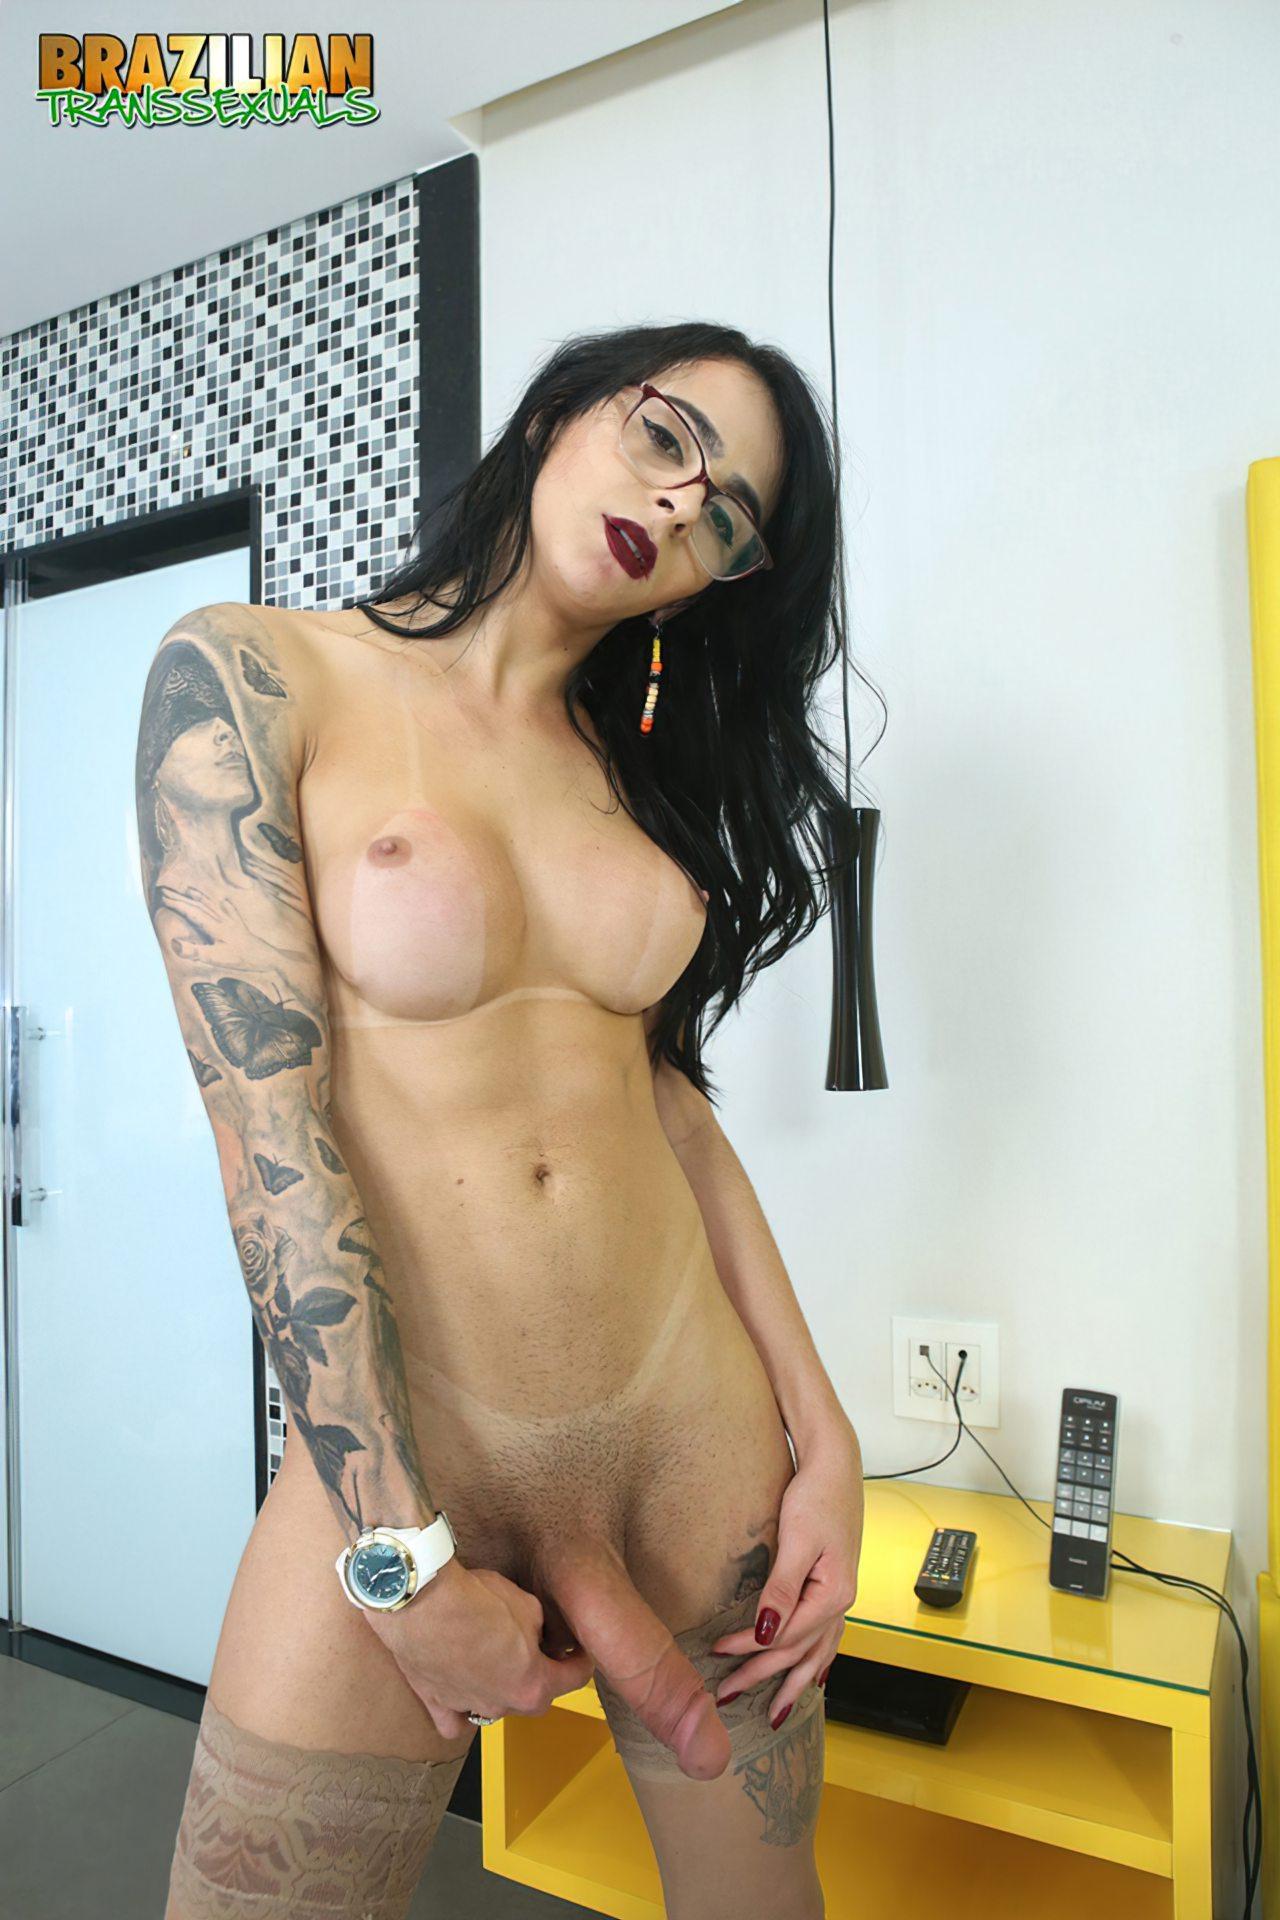 Travestis Imgs (44)